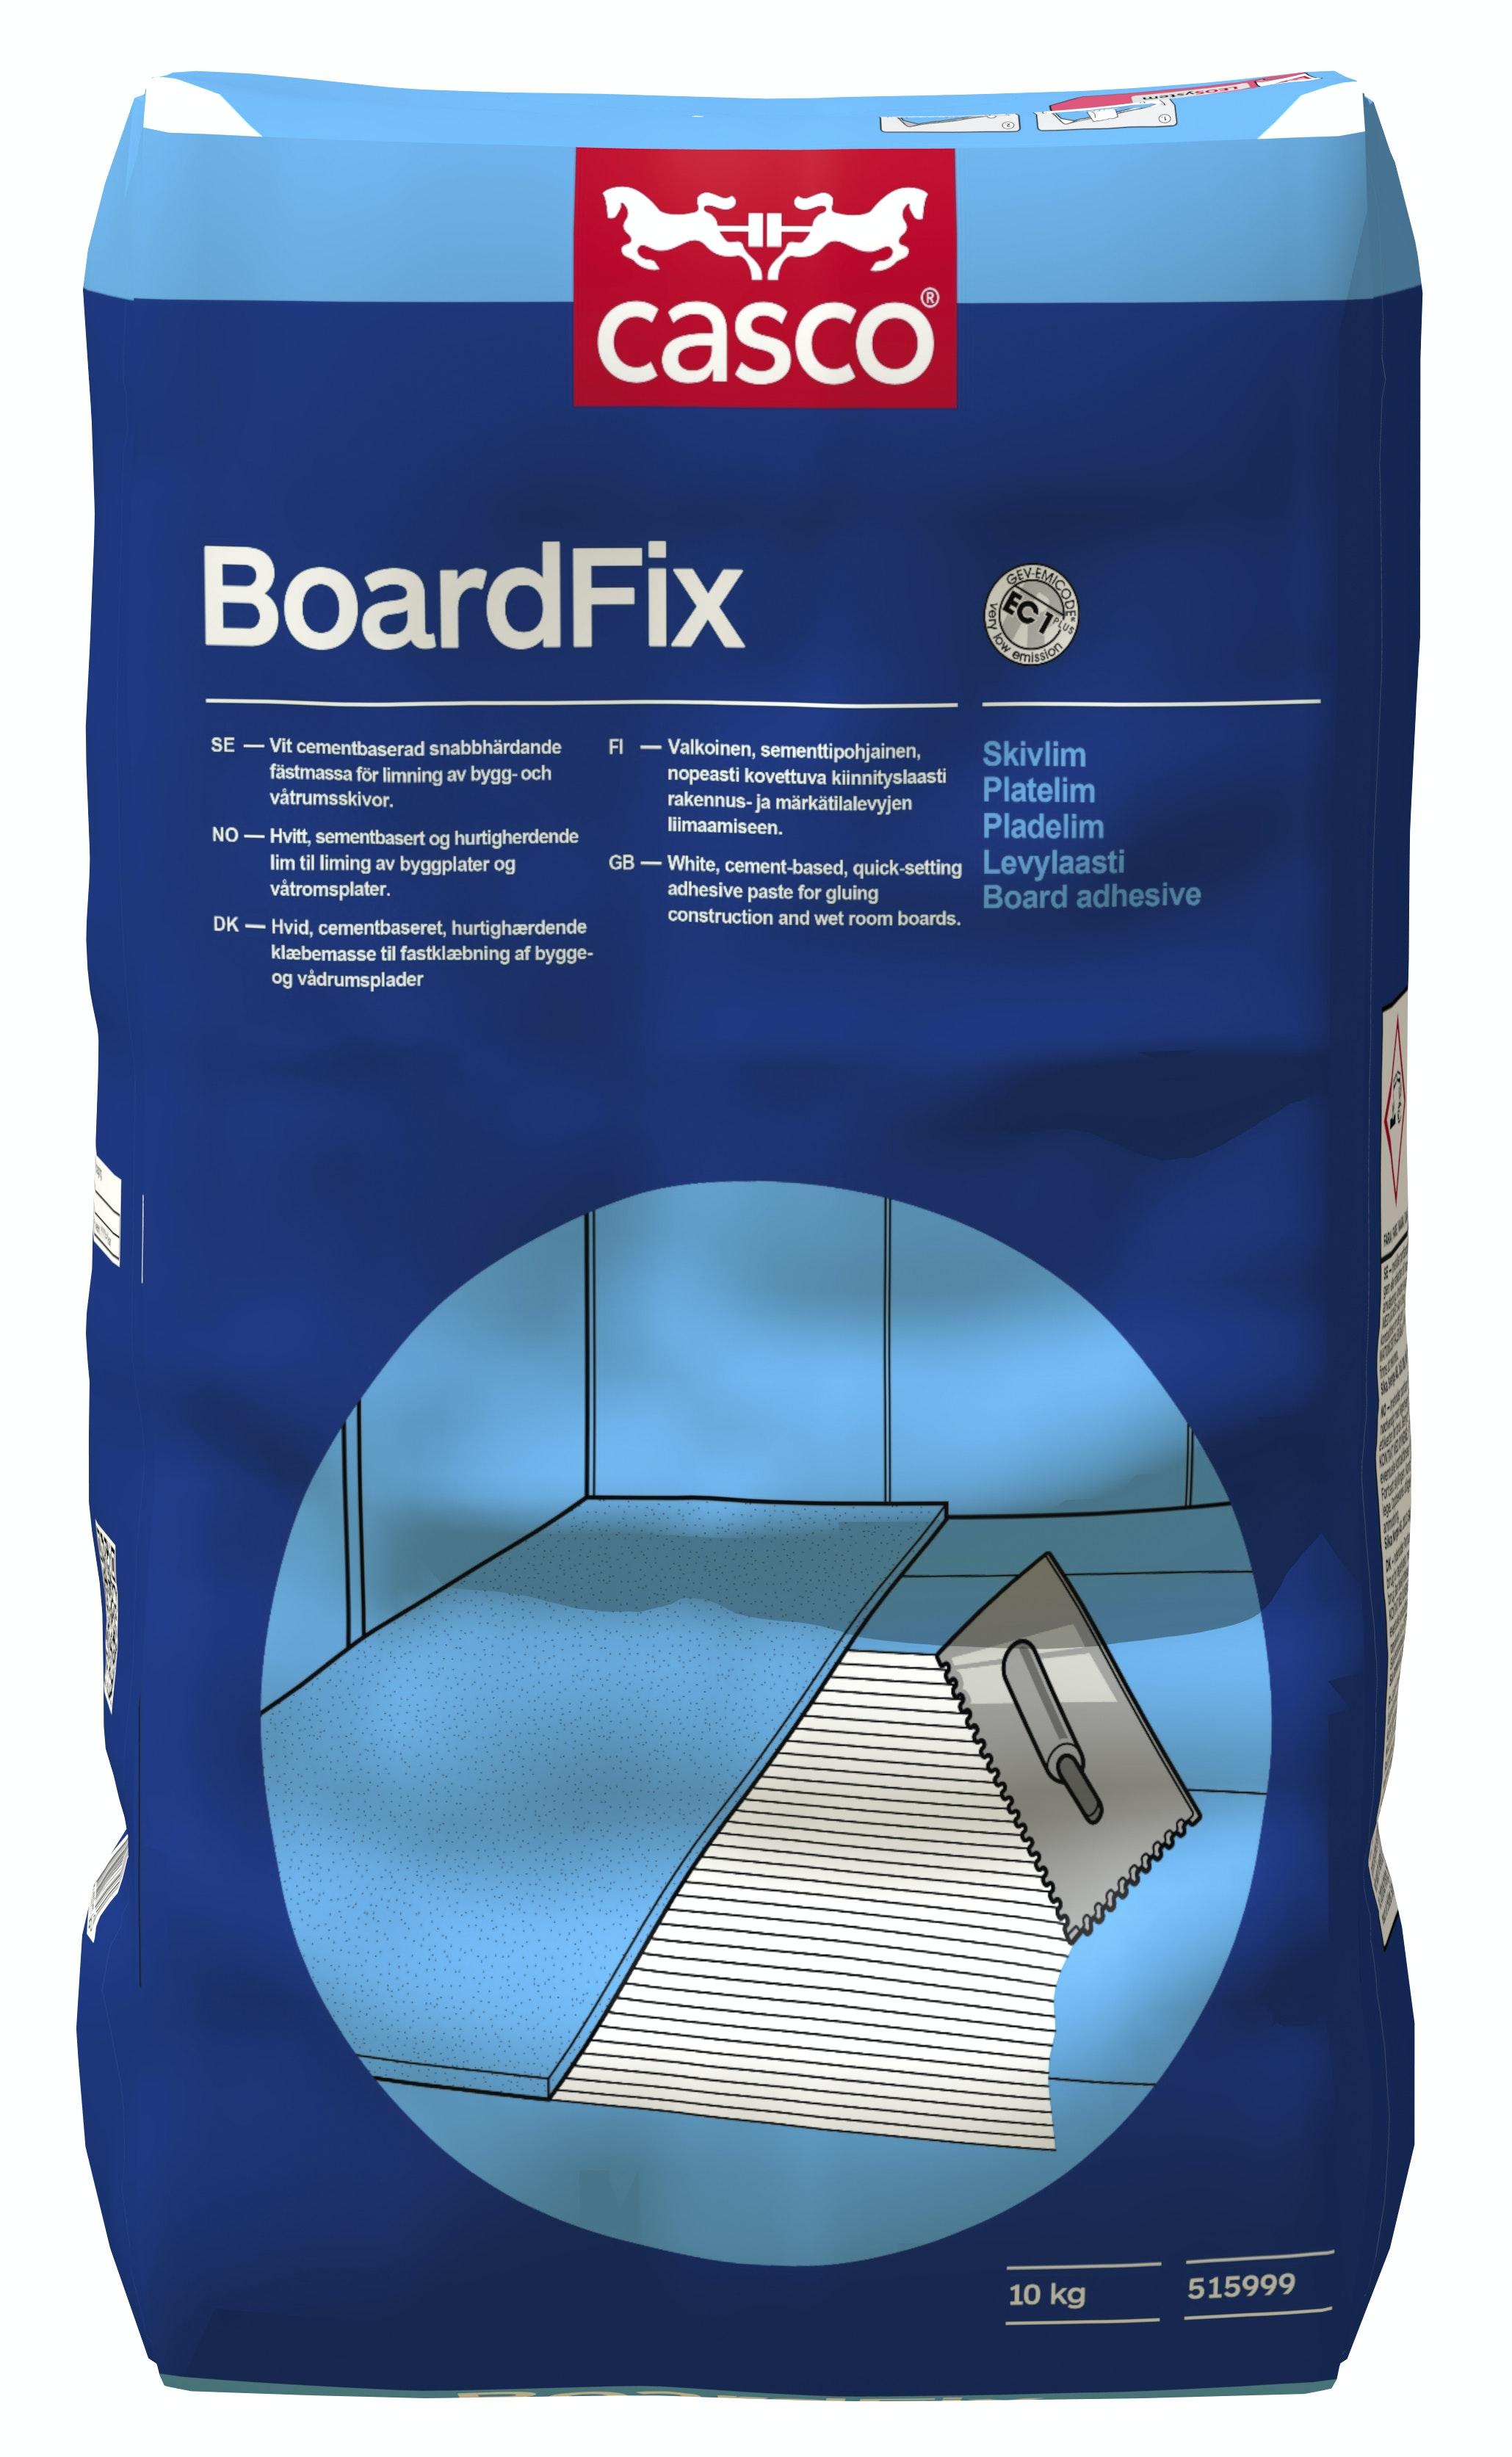 Boardfix Casco SkivLim 10kg